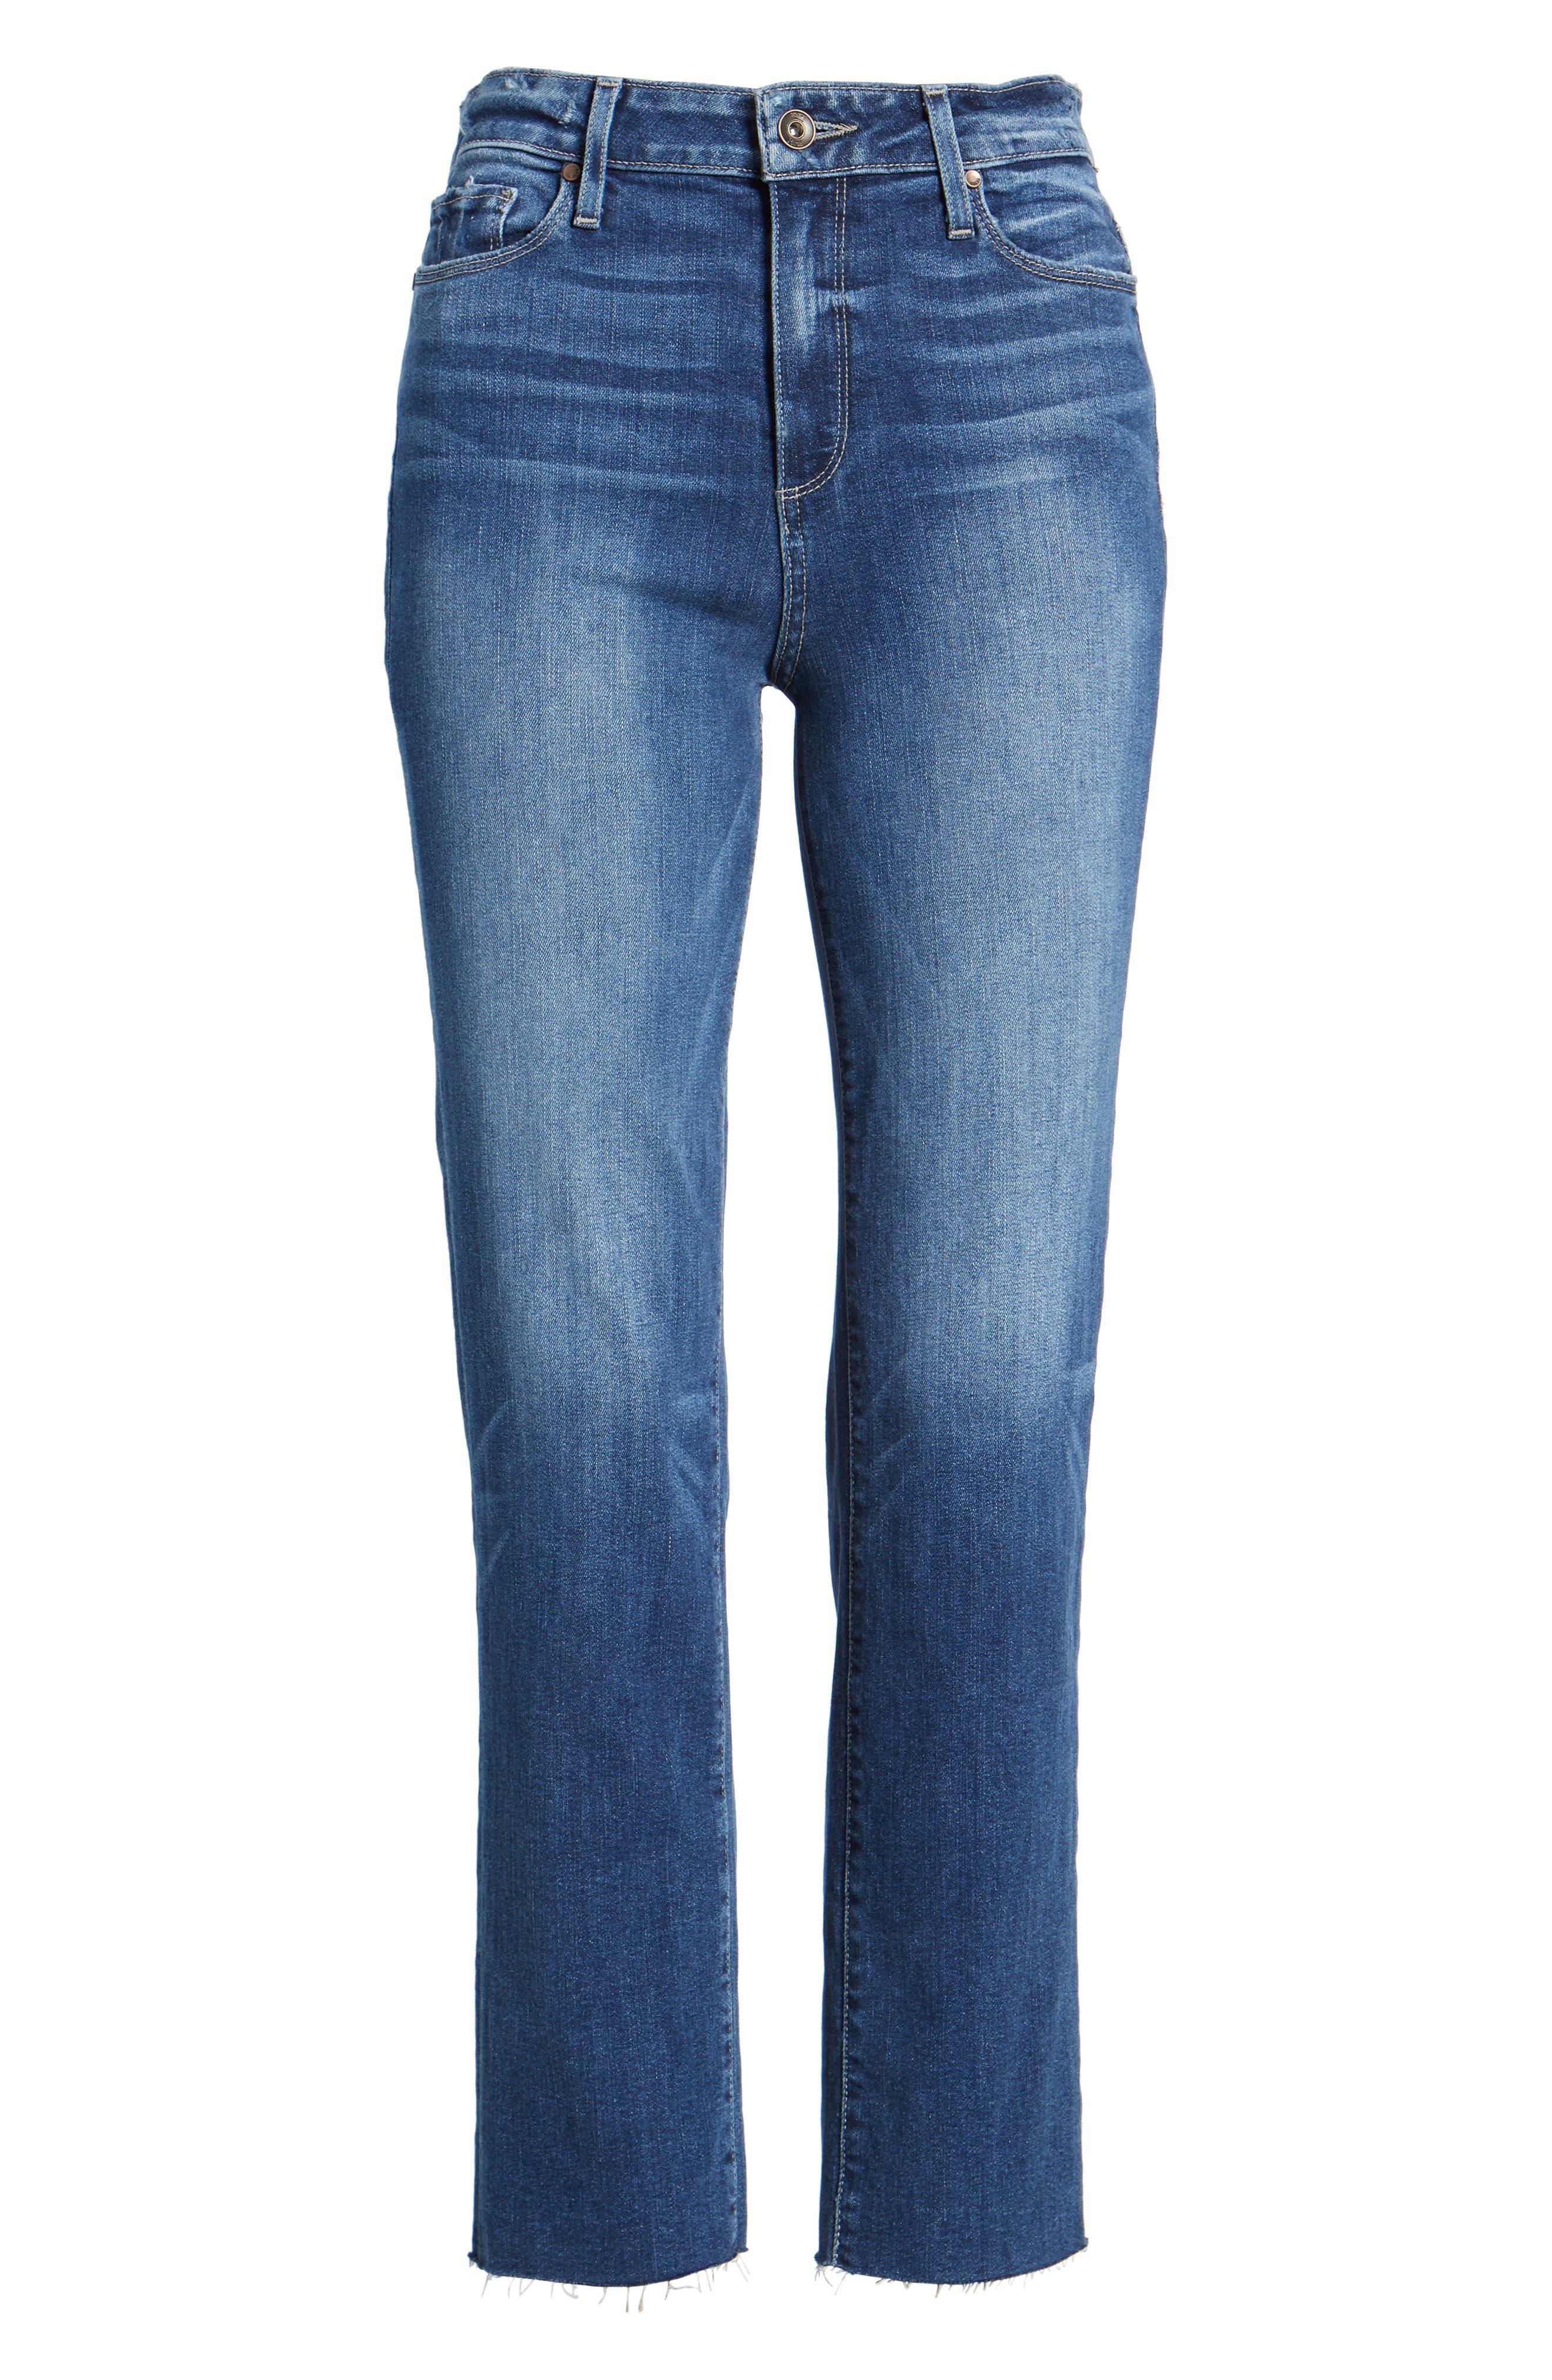 Transcend - Hoxton Ankle Straight Leg Jeans,                             Alternate thumbnail 7, color,                             400